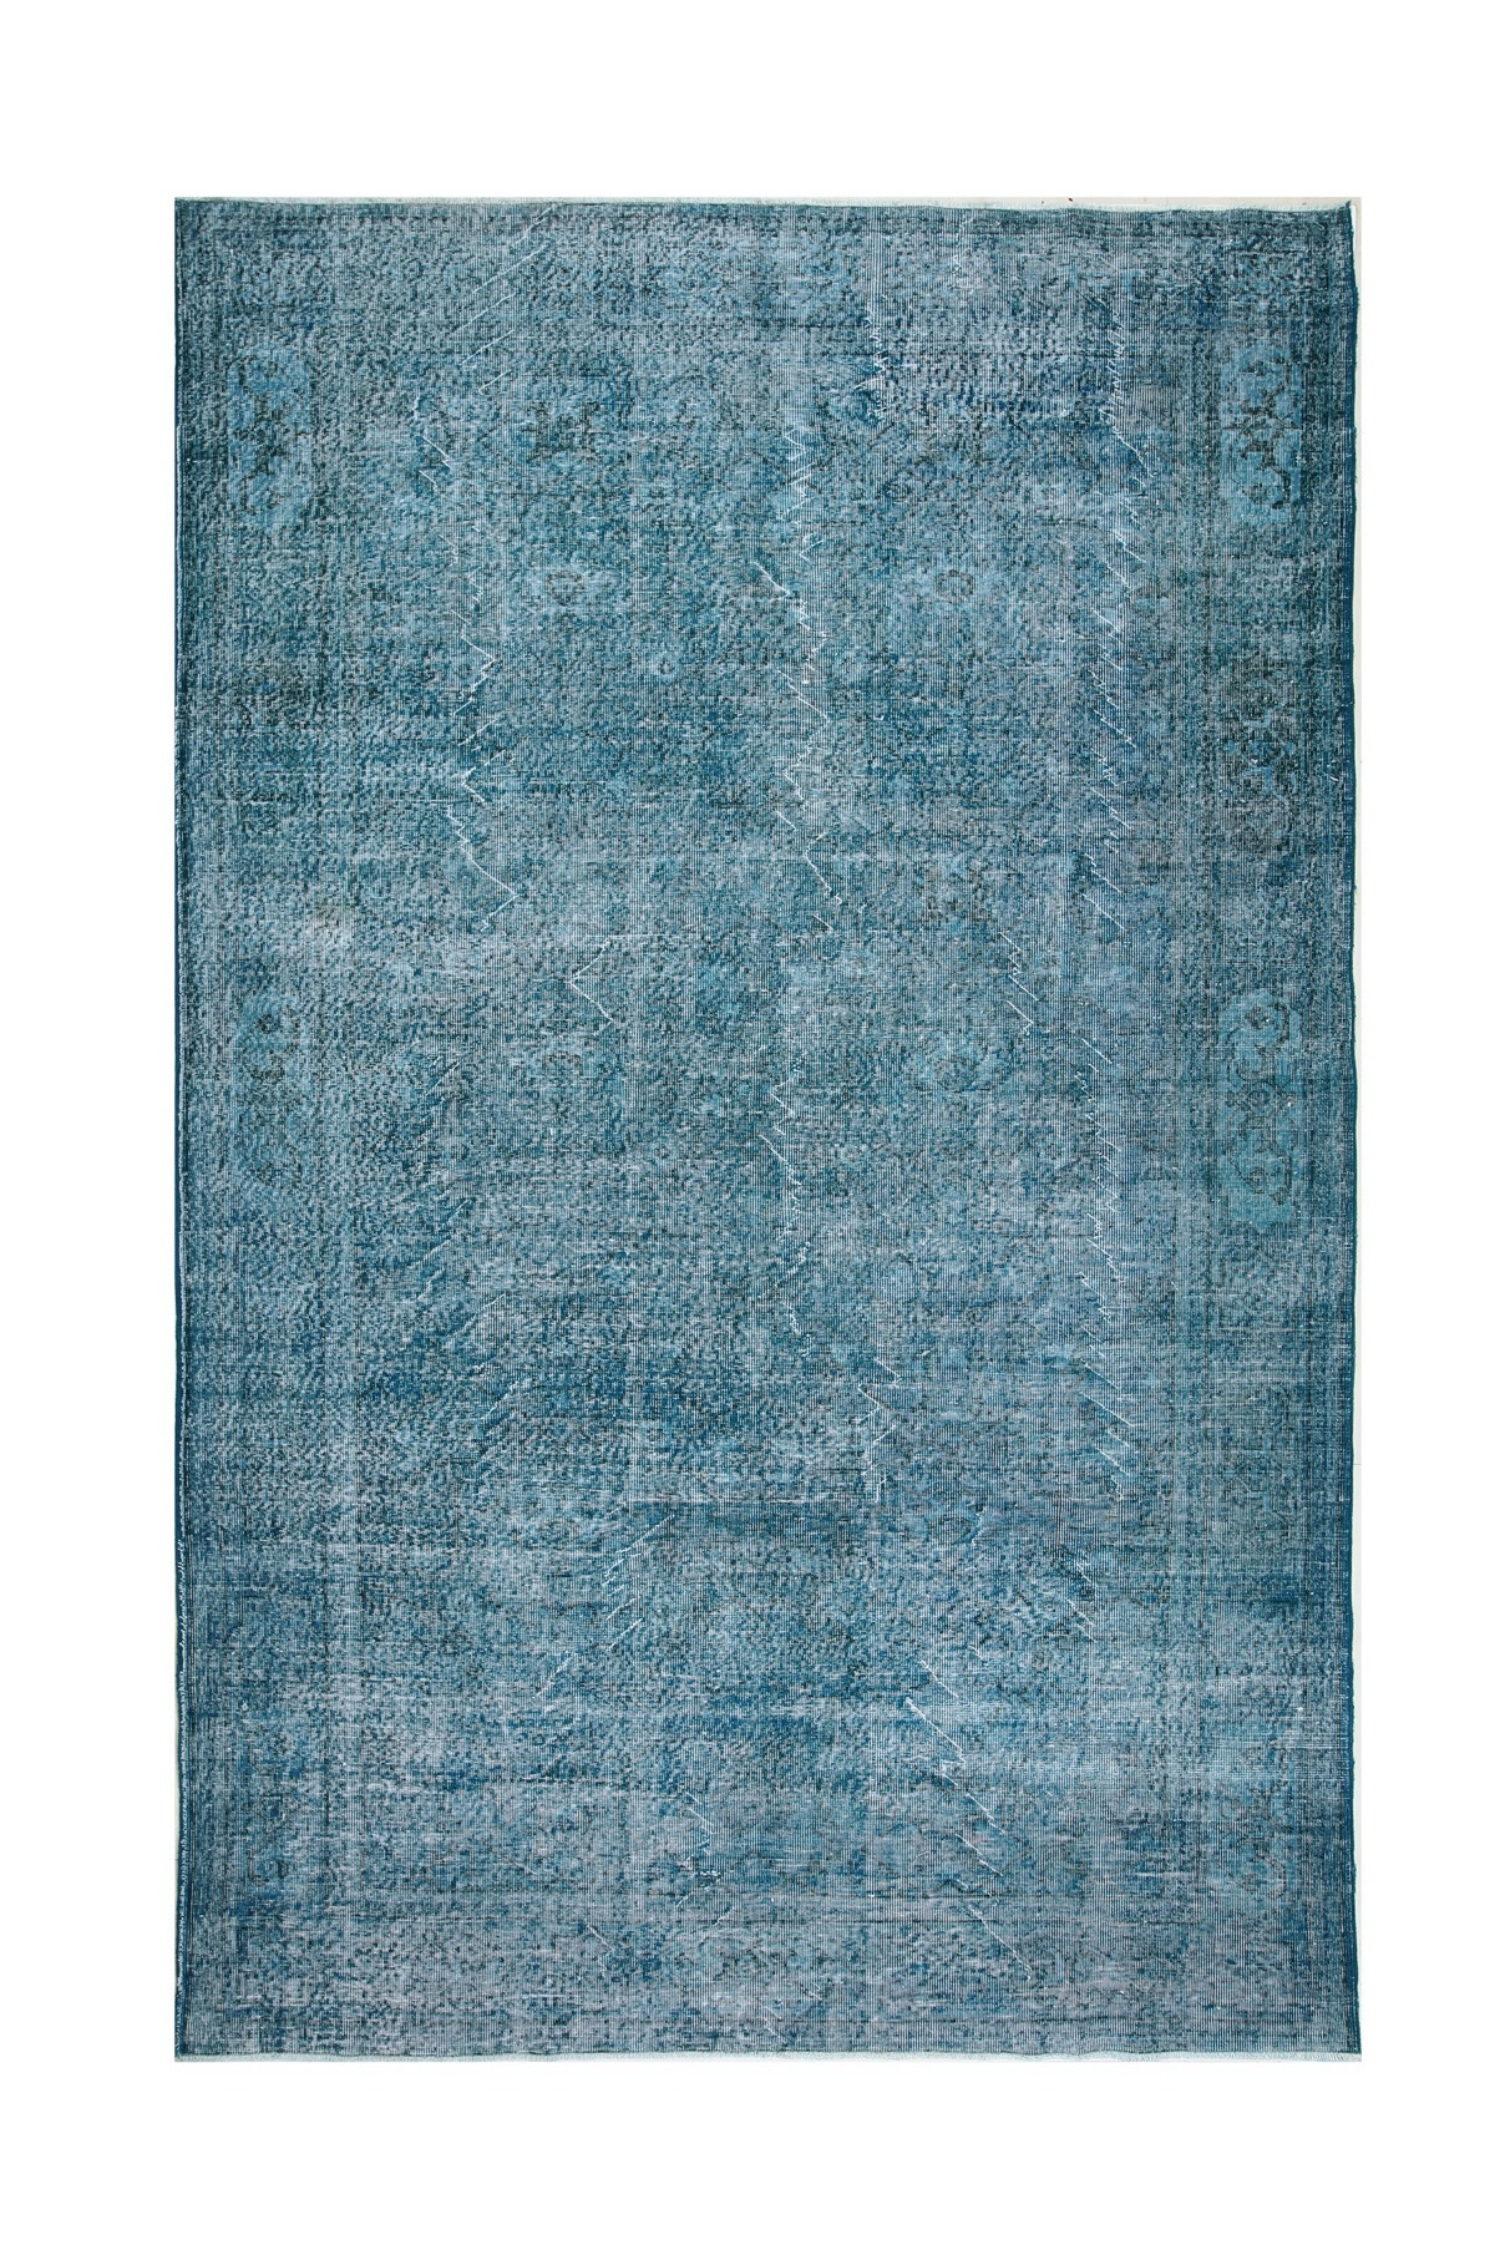 Vintage Overdyed Blue 6487